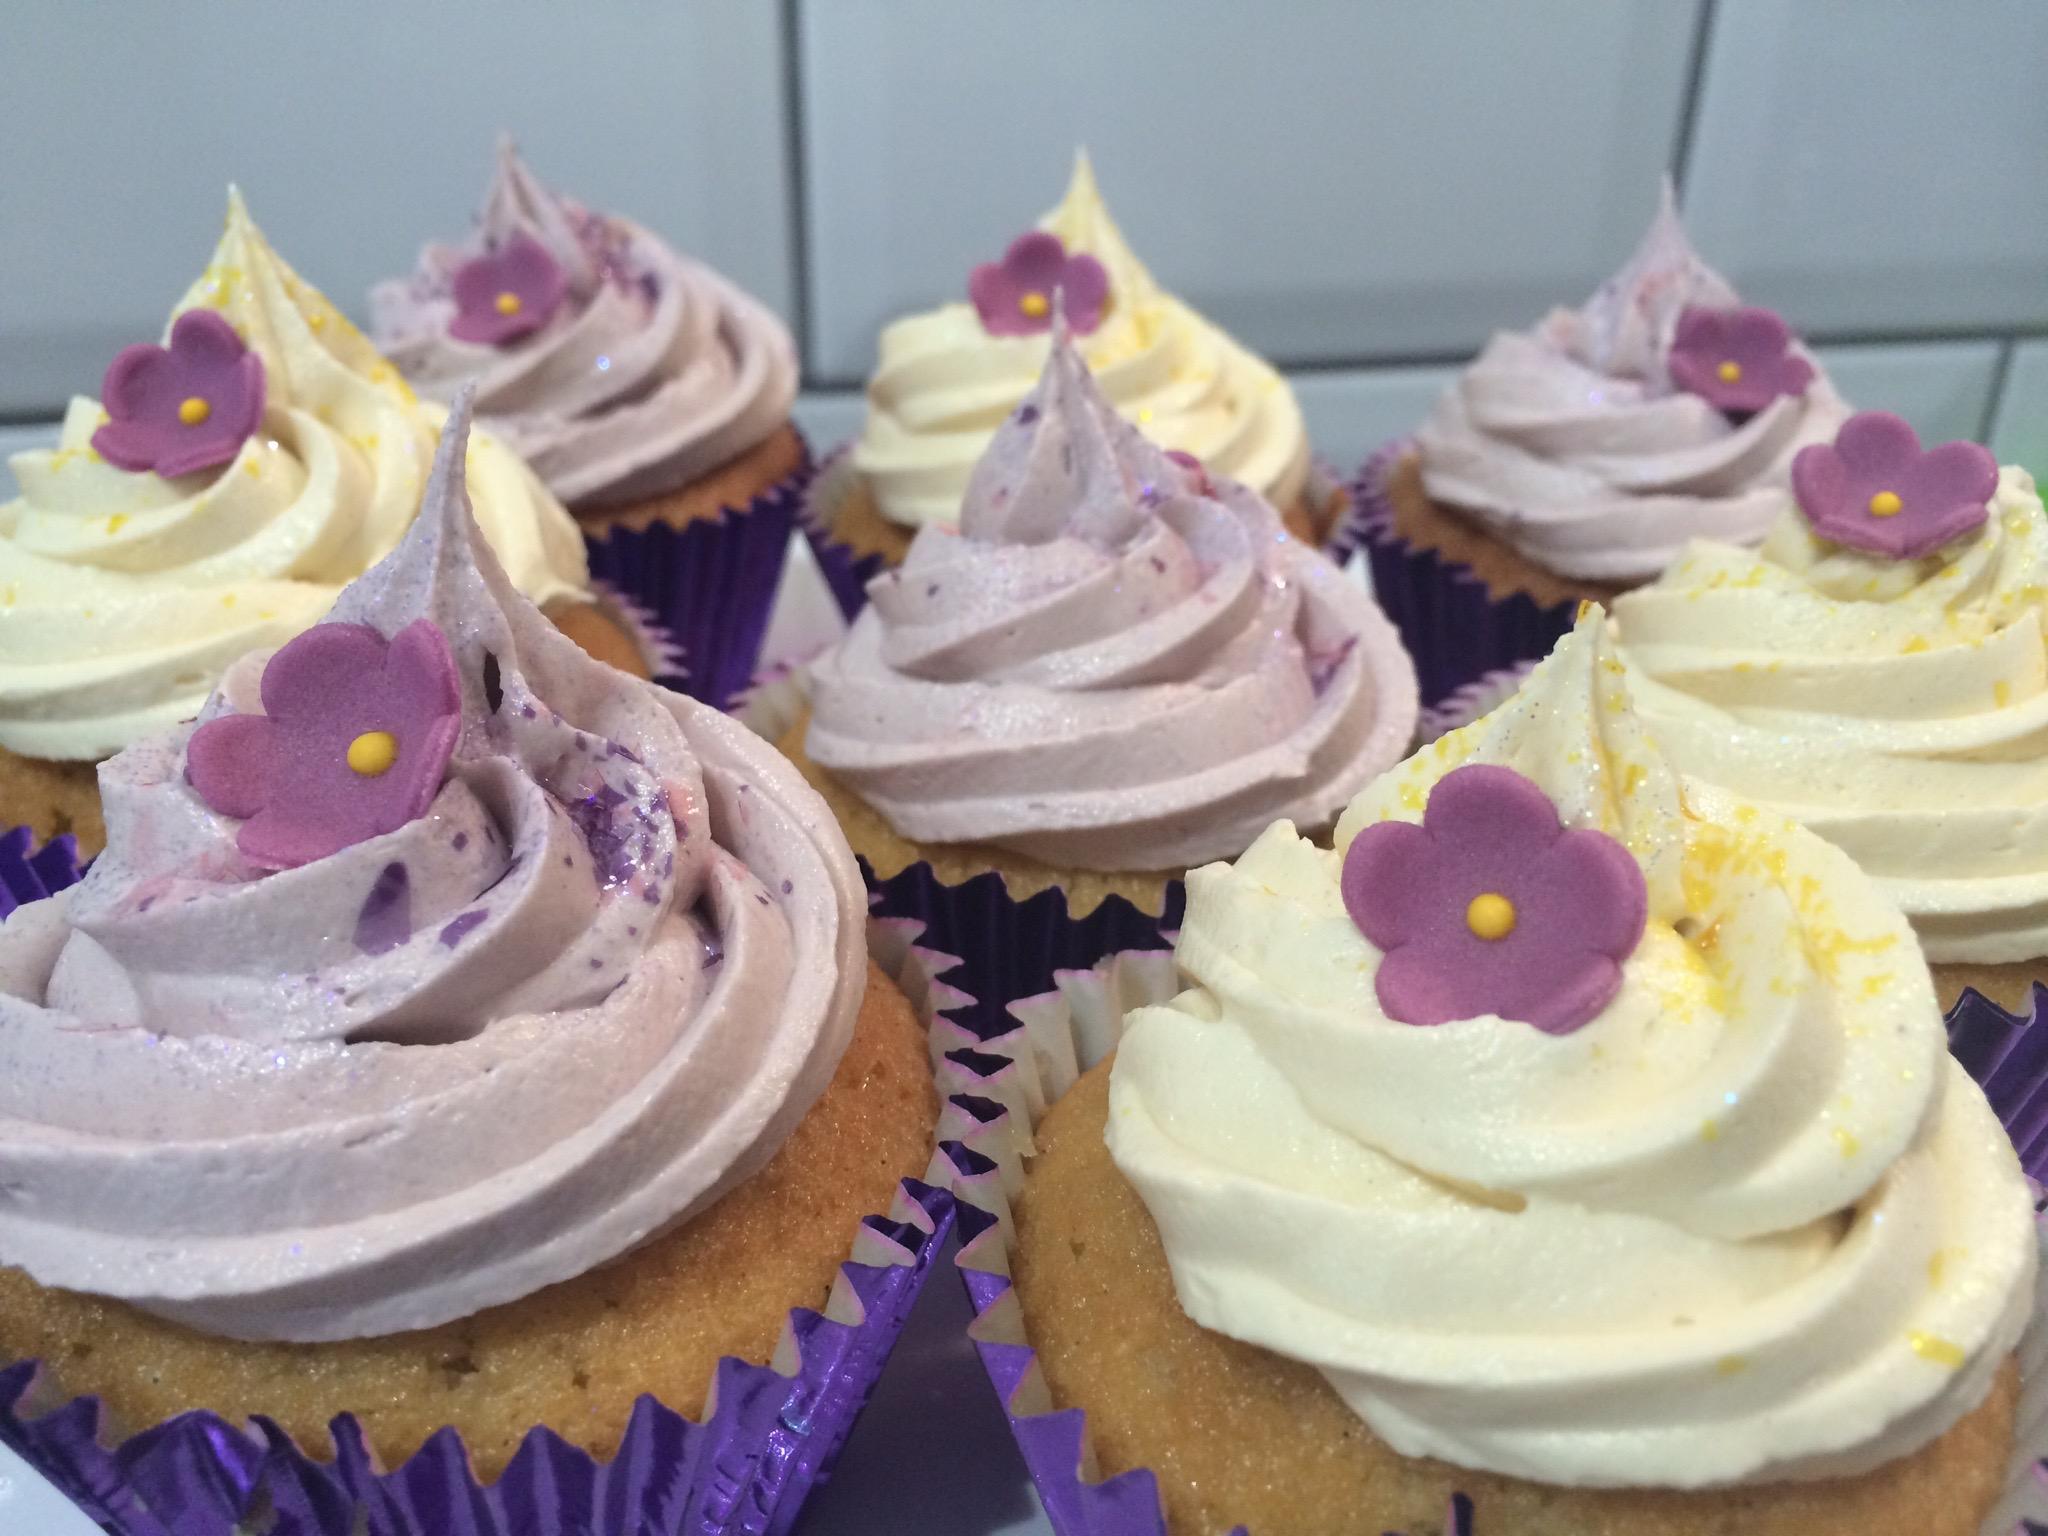 Purple Swirl Cupcakes